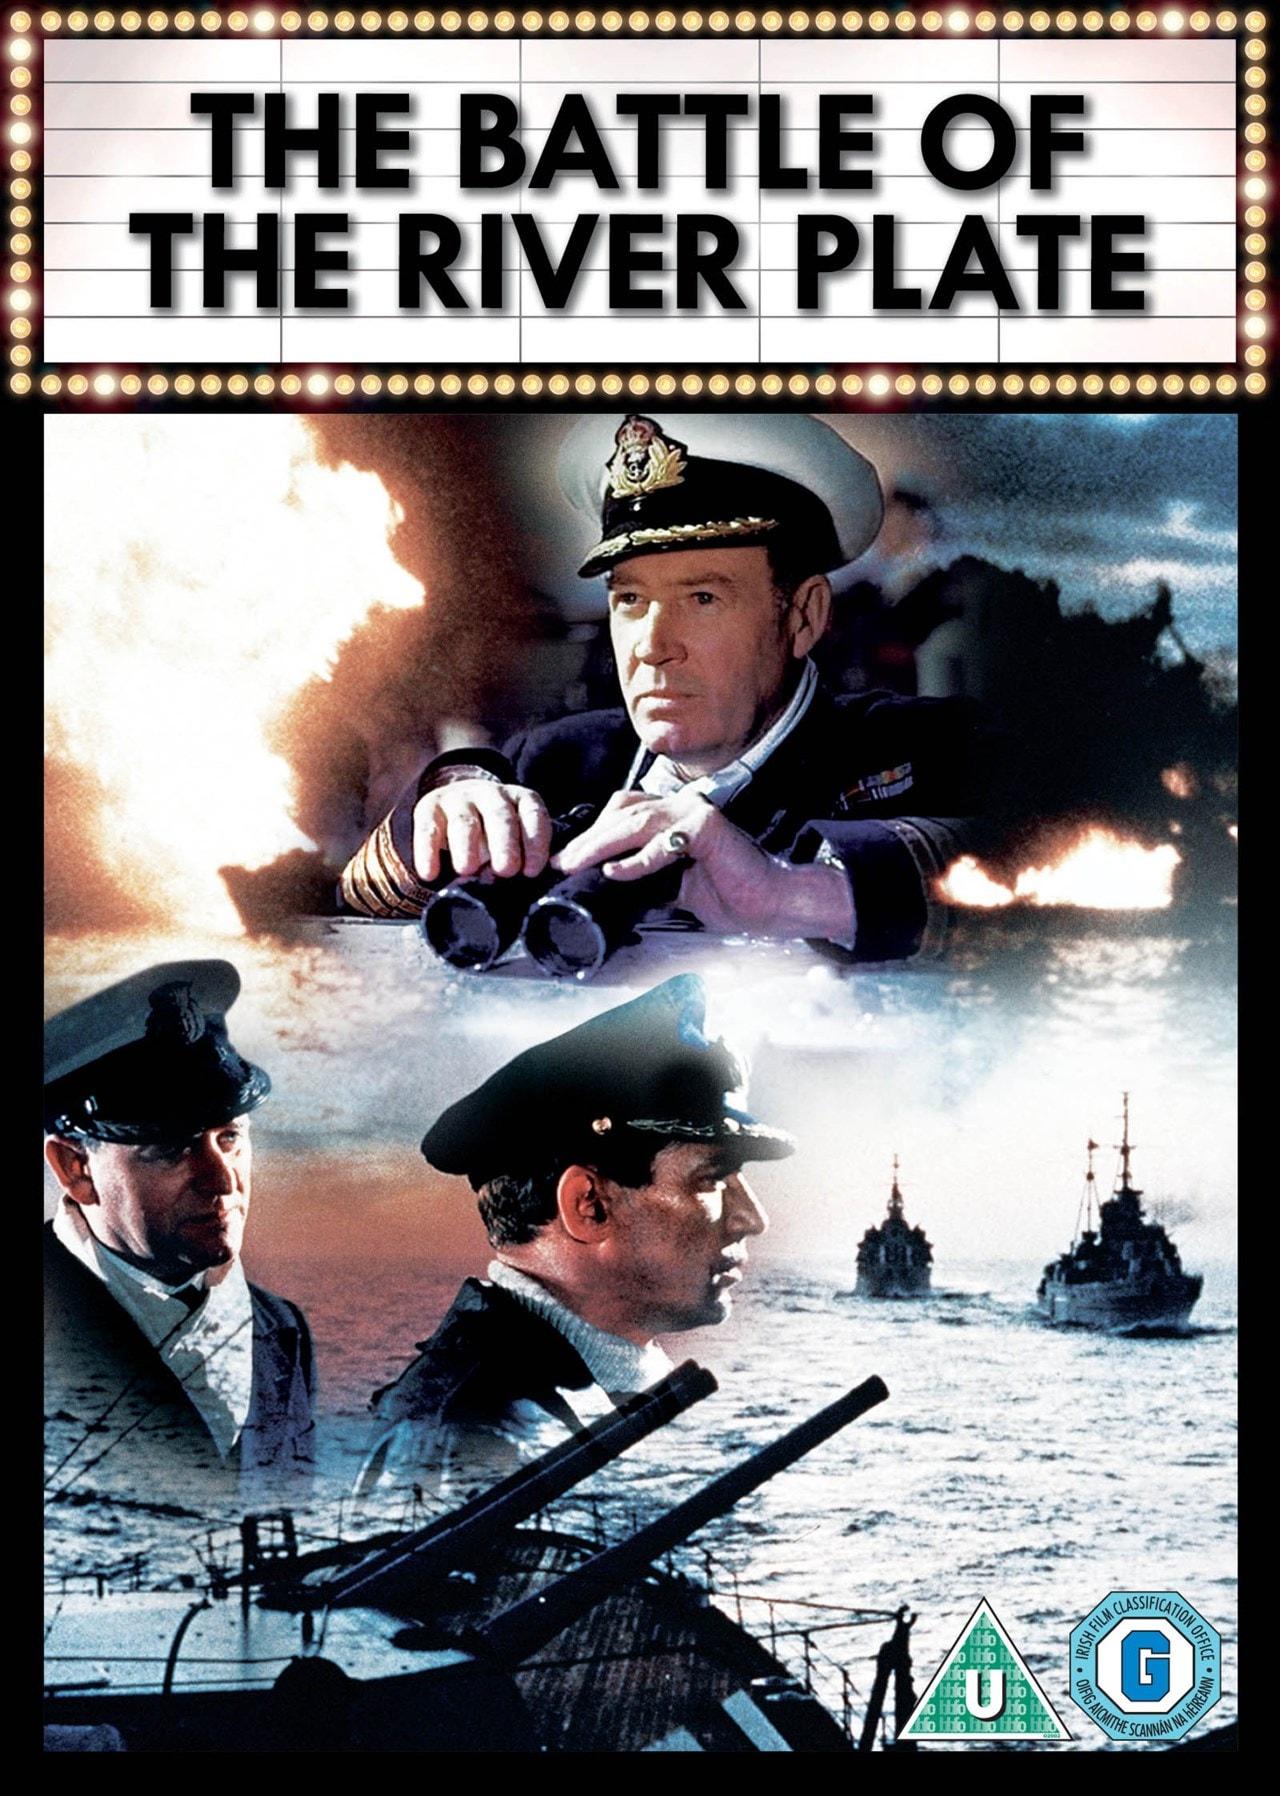 The Battle of the River Plate - British Classics (hmv Exclusive) - 1